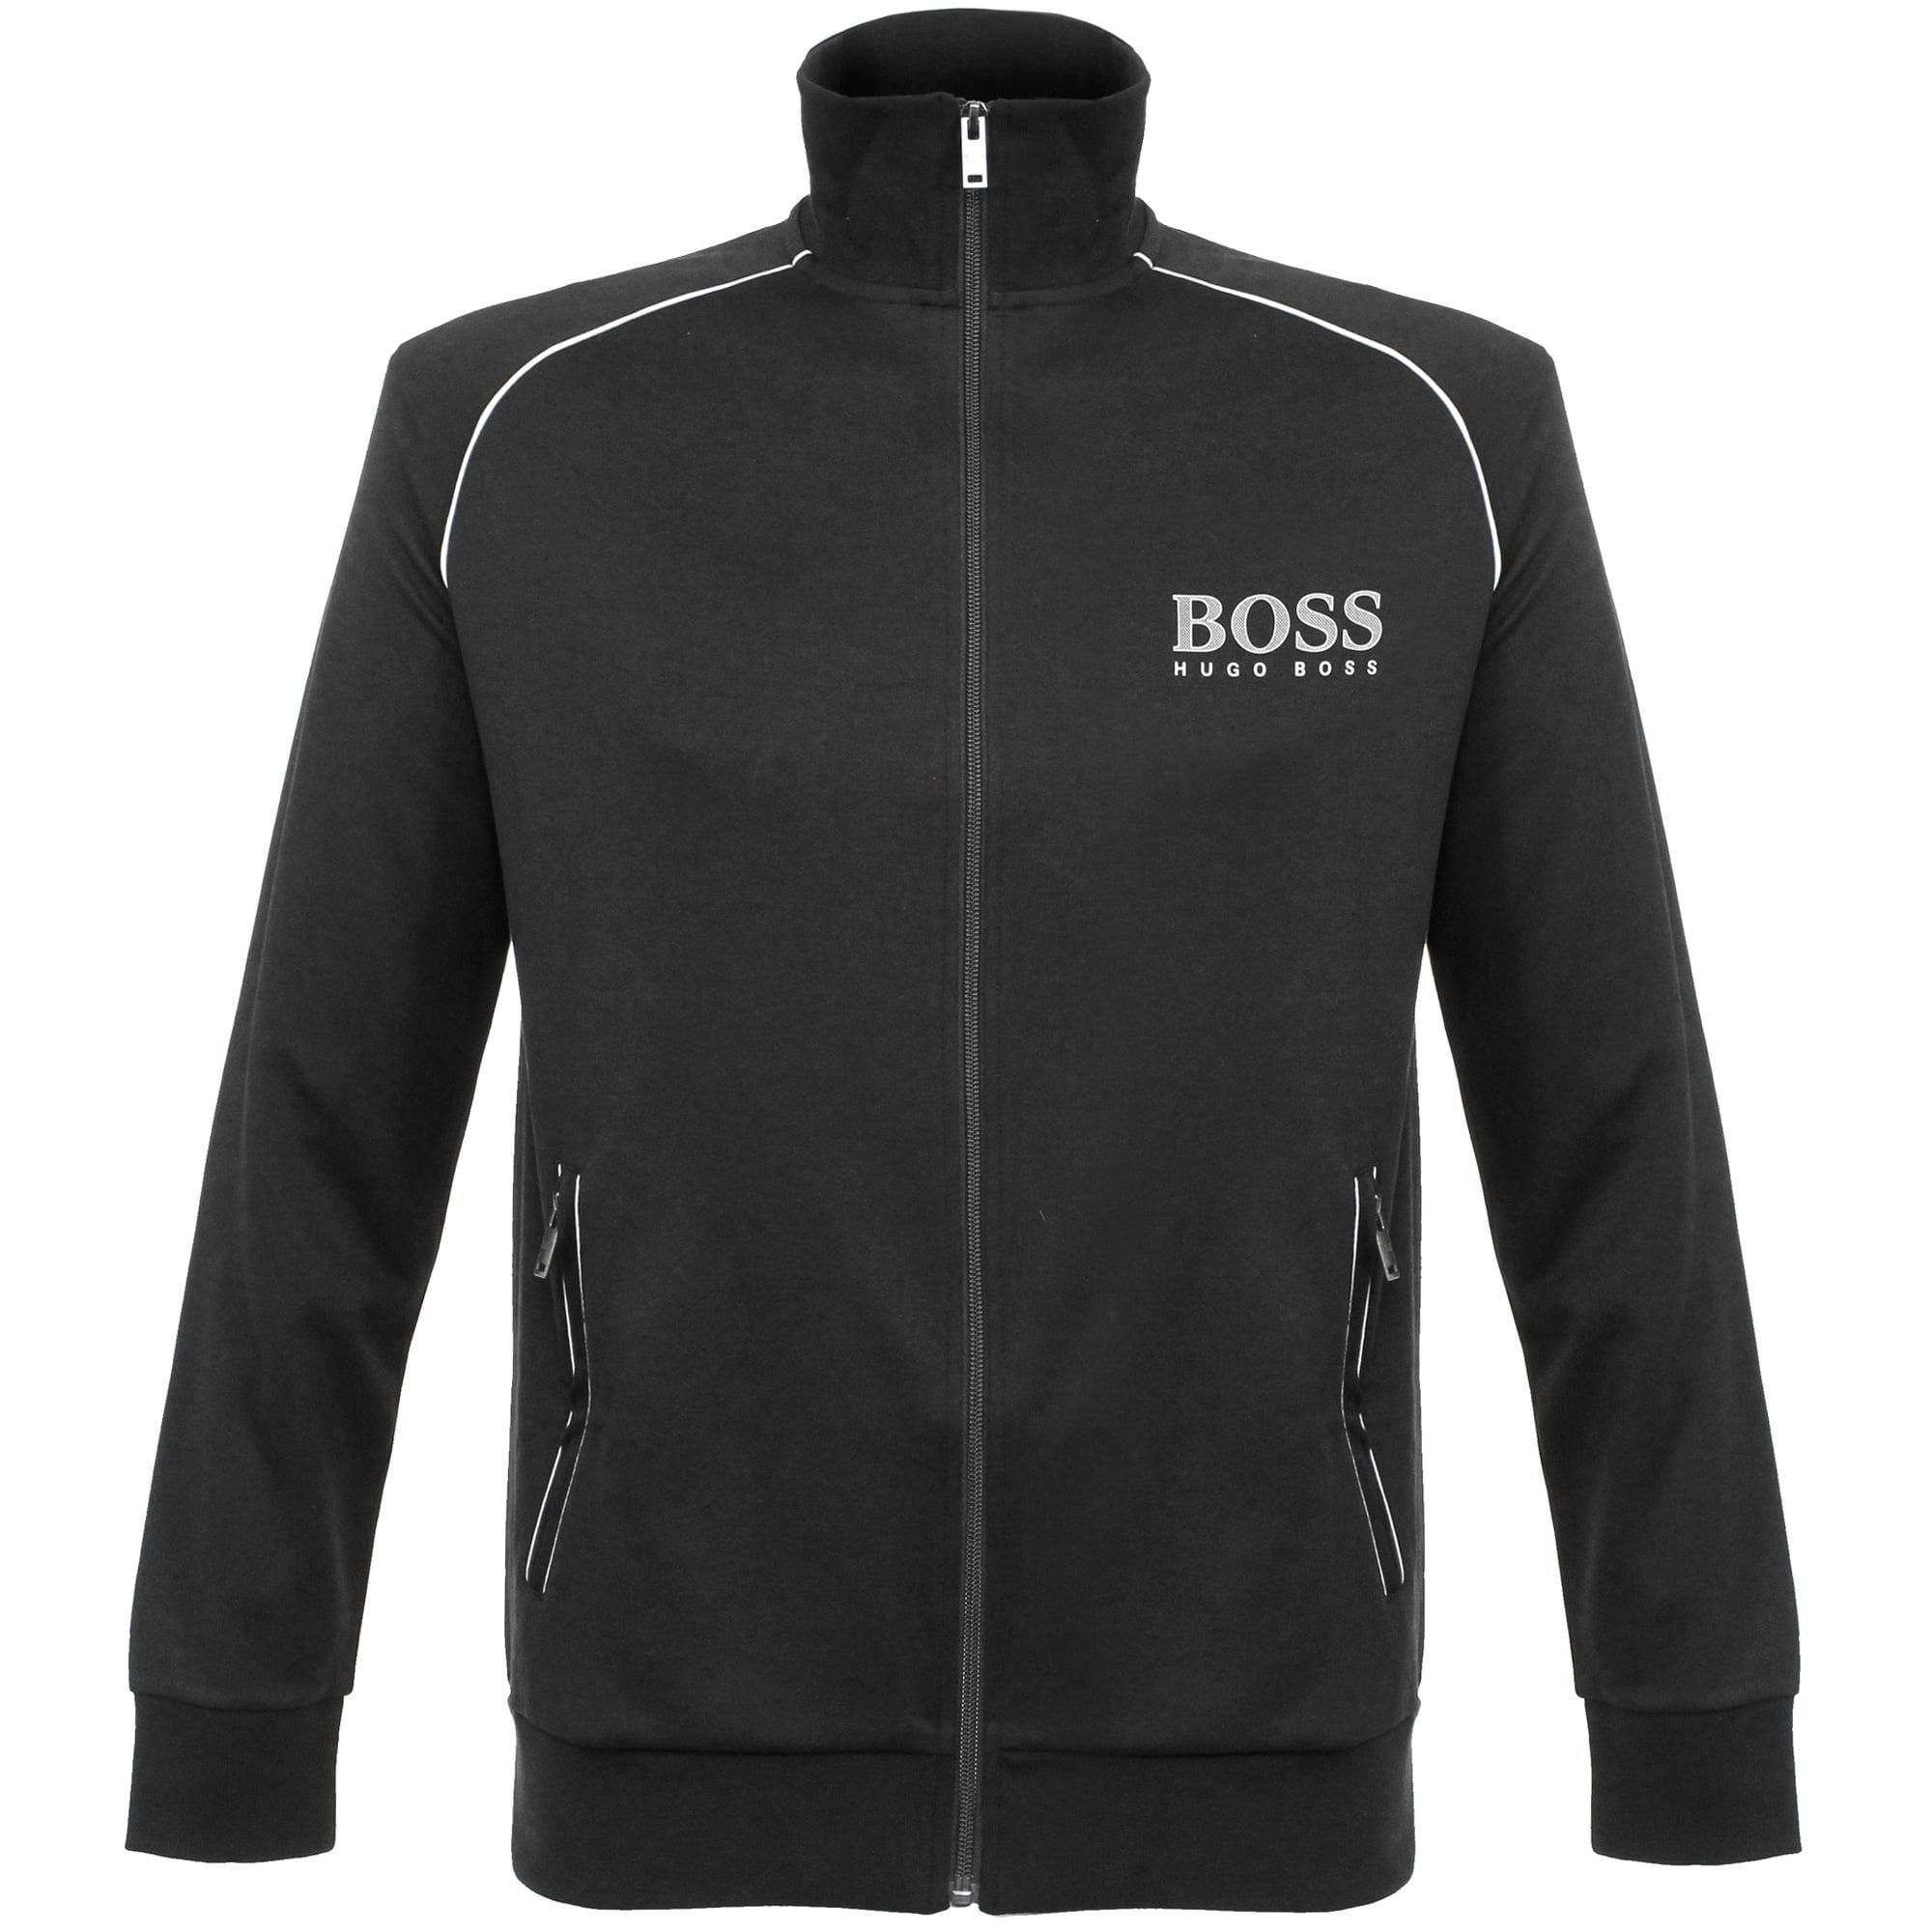 4b54f3505 Hugo Boss London Shop | Jacket Zip Black Track Top